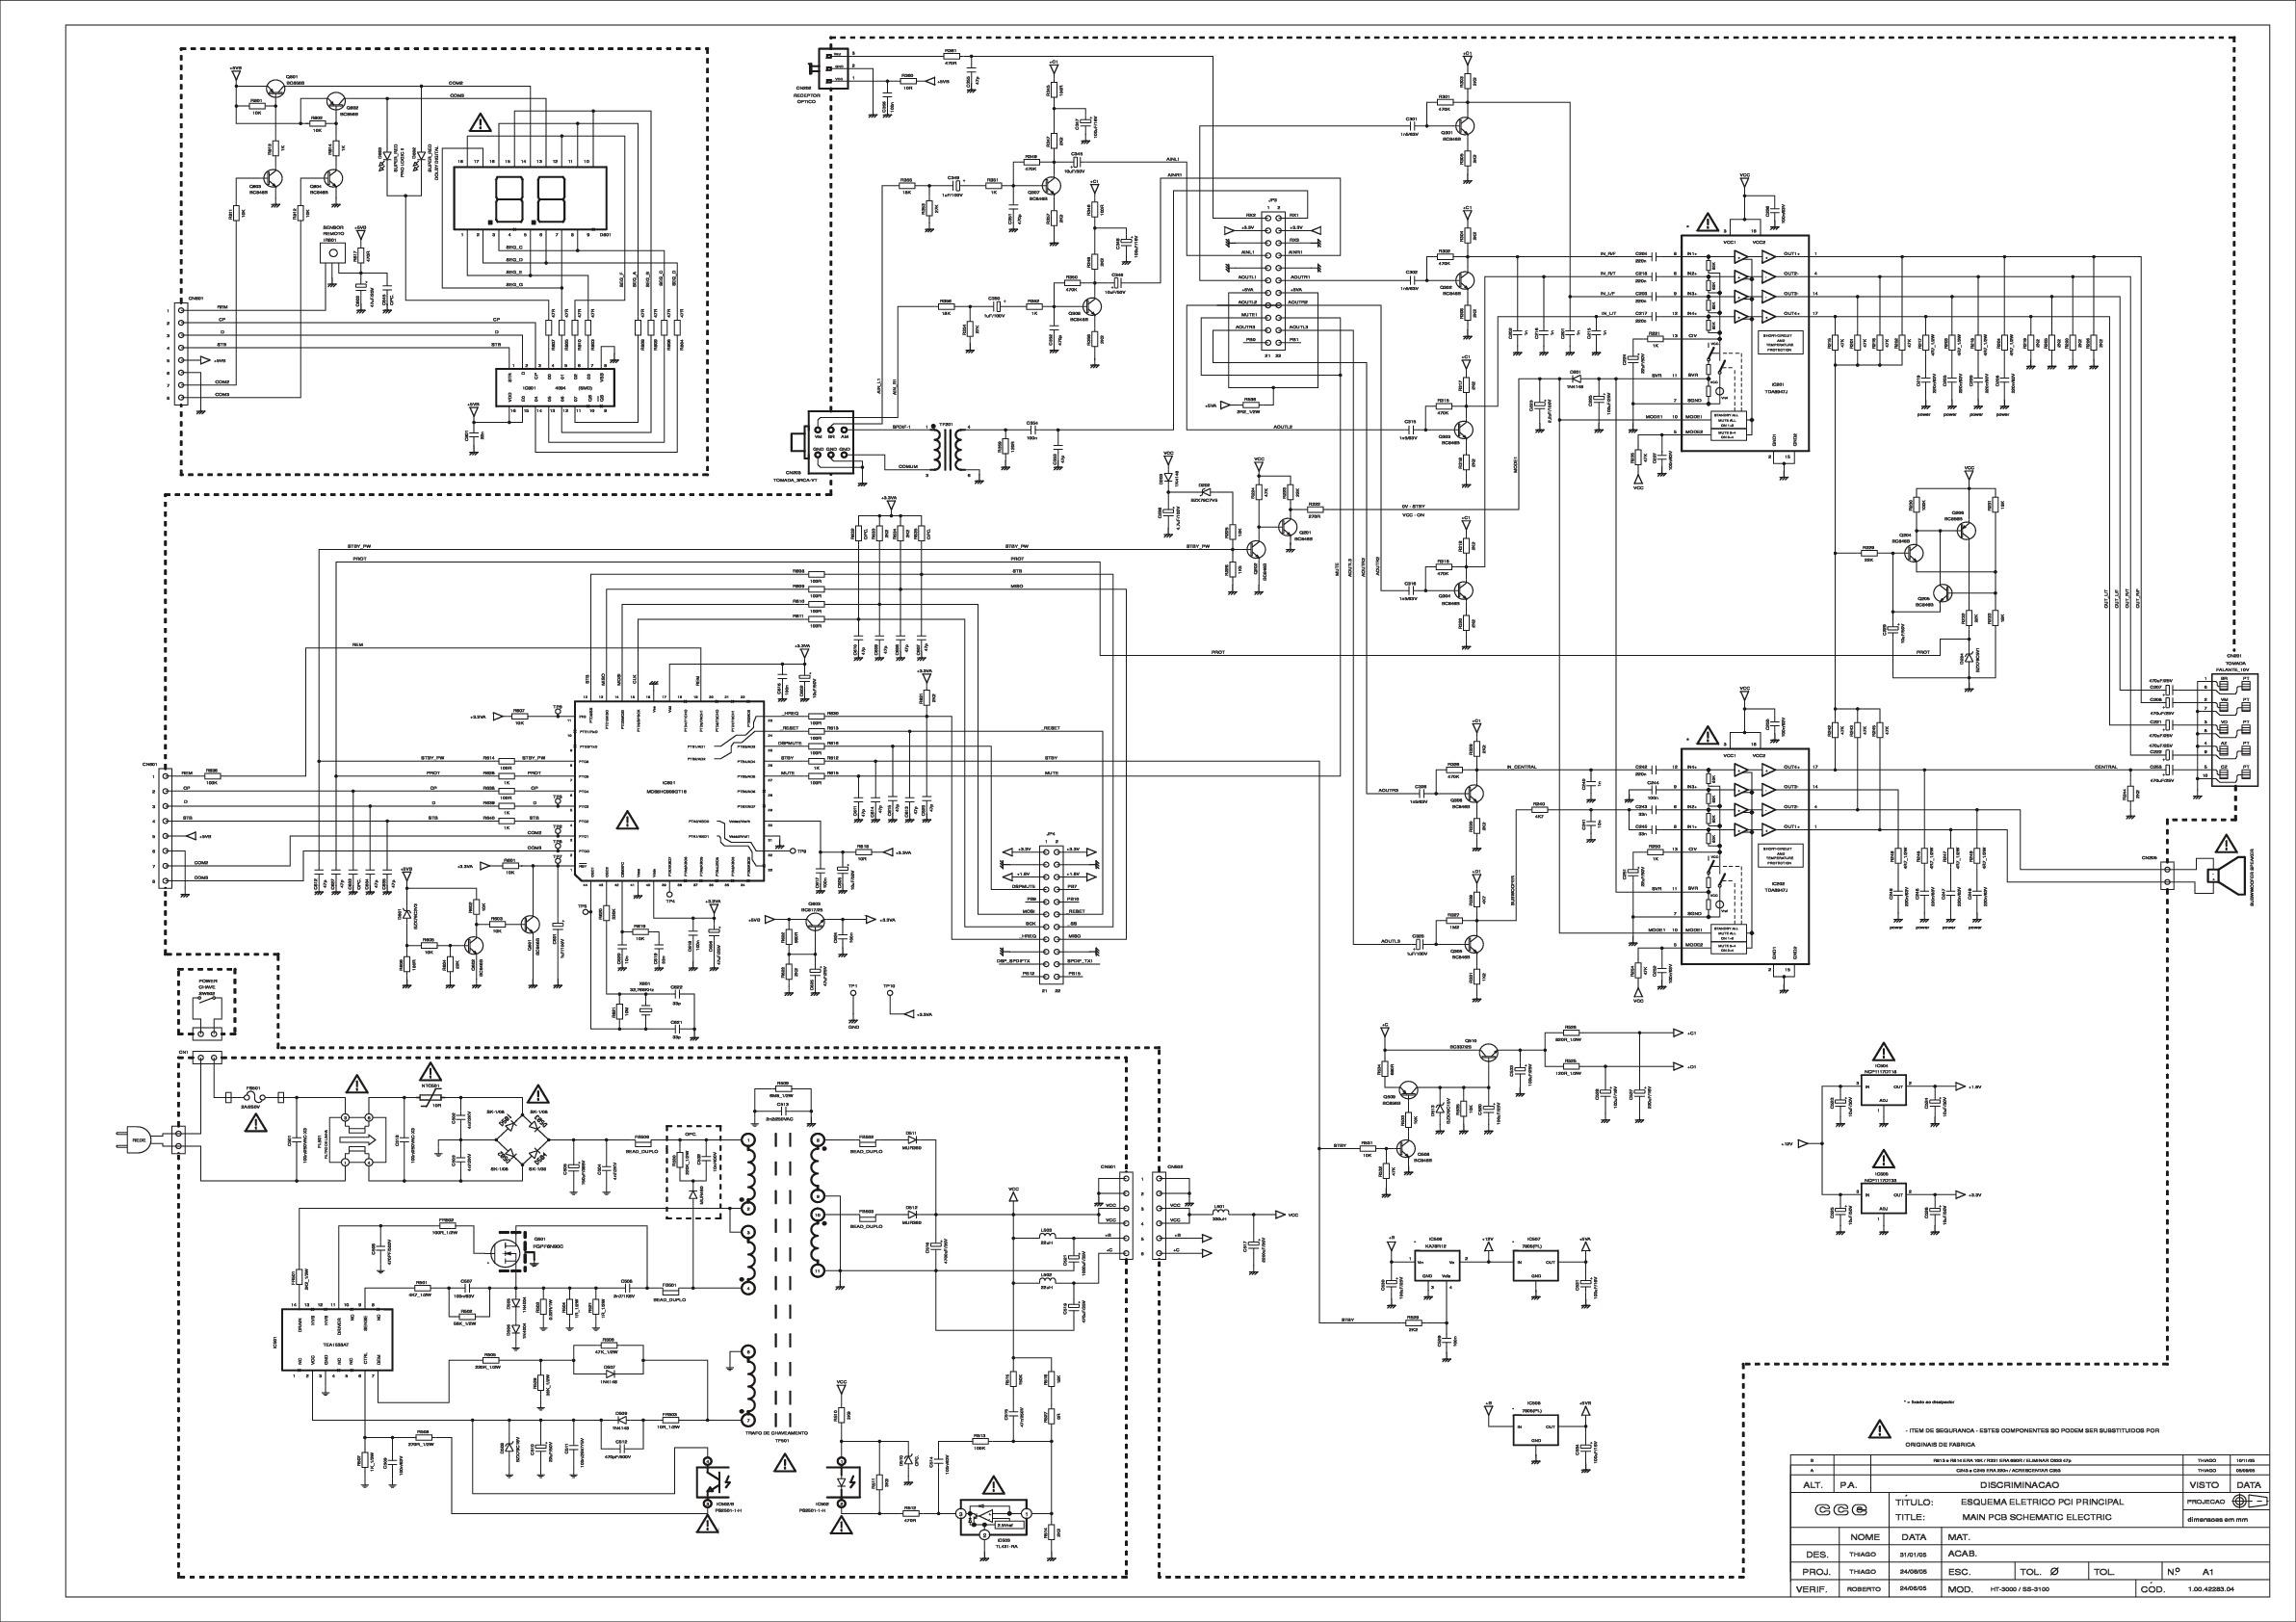 CCE HT-3000 SS-3100 HT-4000A HT-4000B Diagrama Esquematico